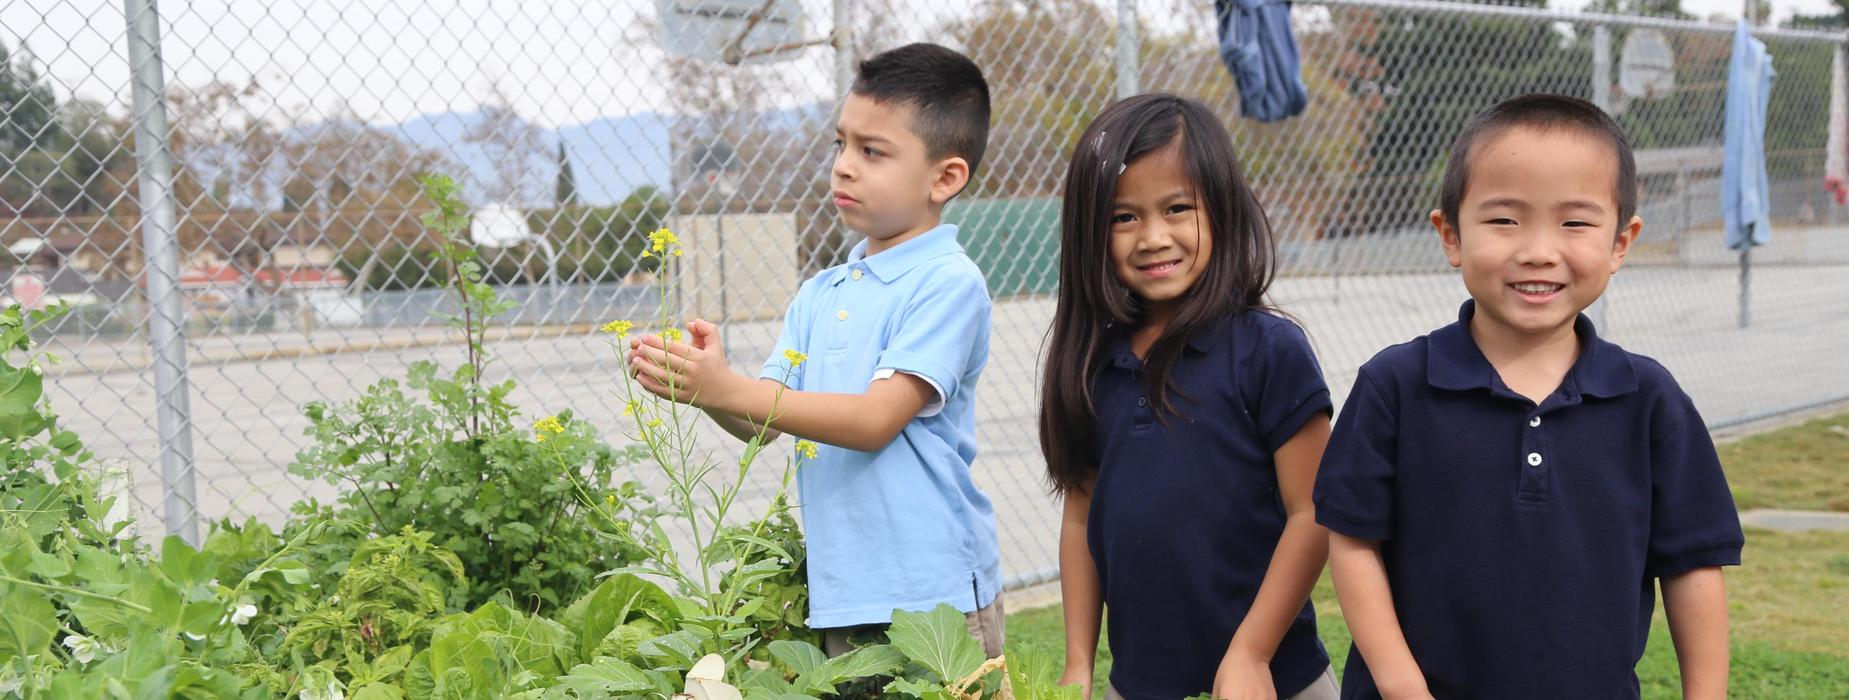 Monterey Highlands Elementary School